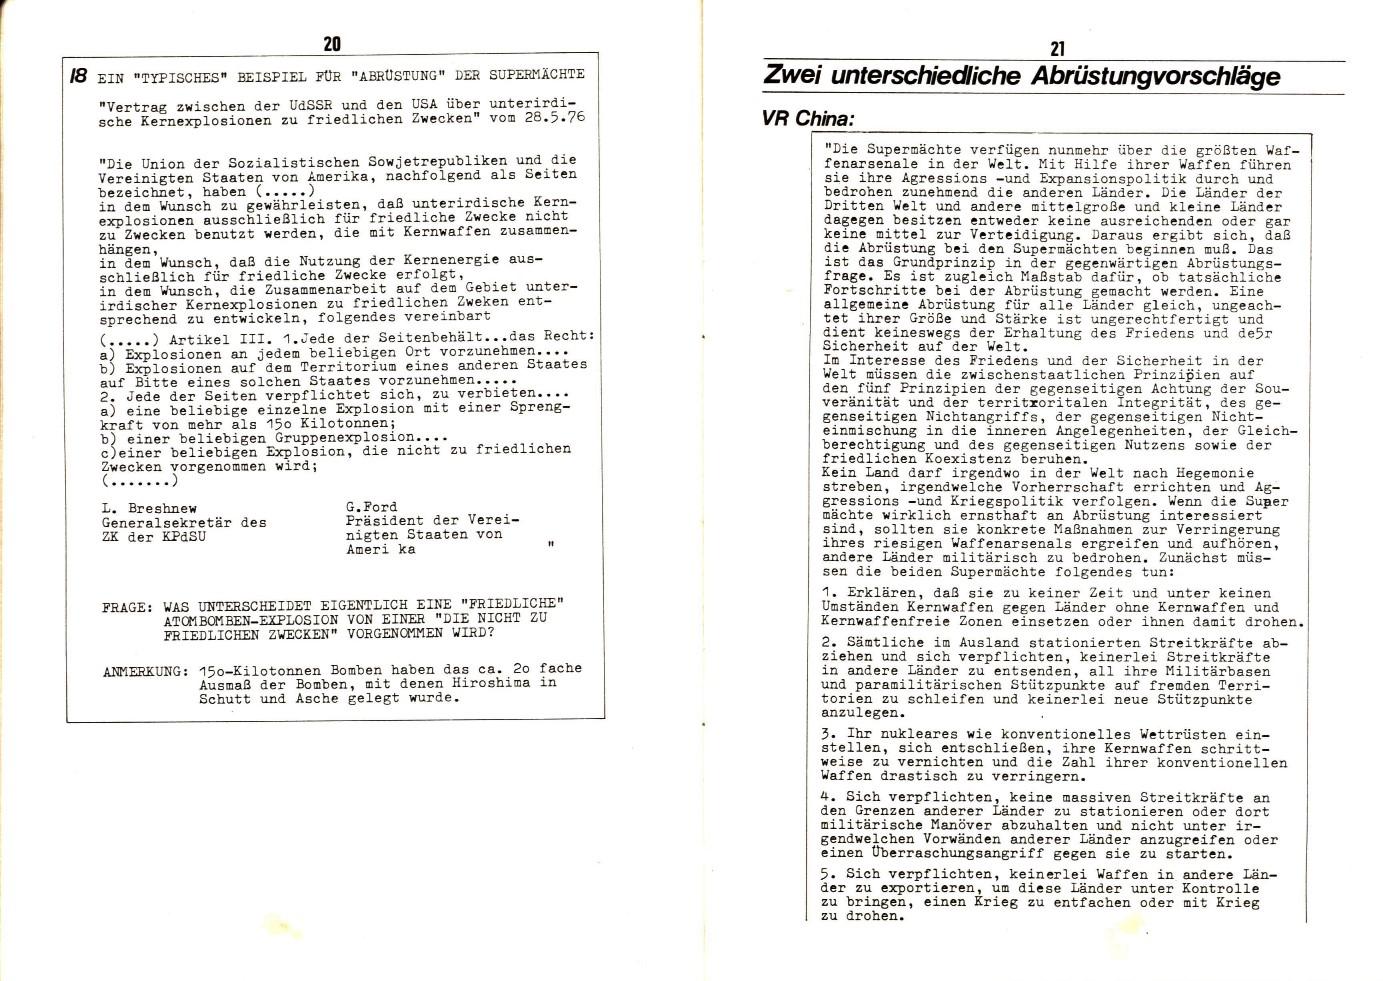 KJVD_1979_Dokumente_zum_Antikriegstag_16